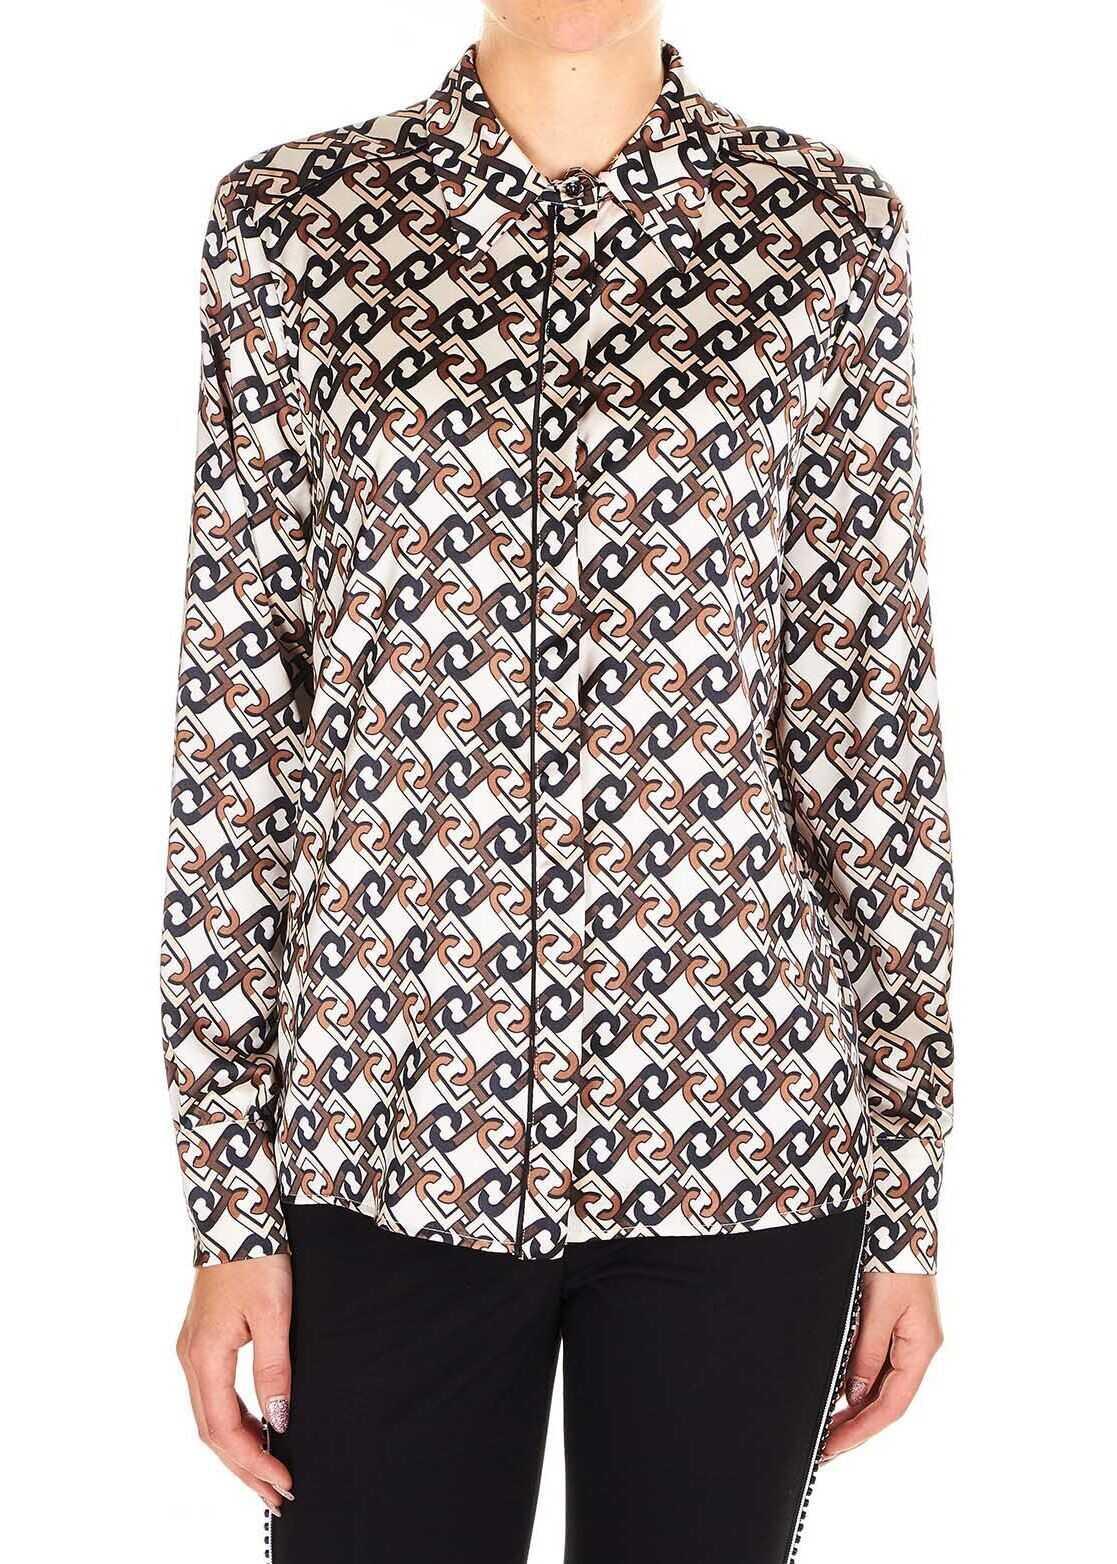 Liu Jo Polyester Shirt BEIGE